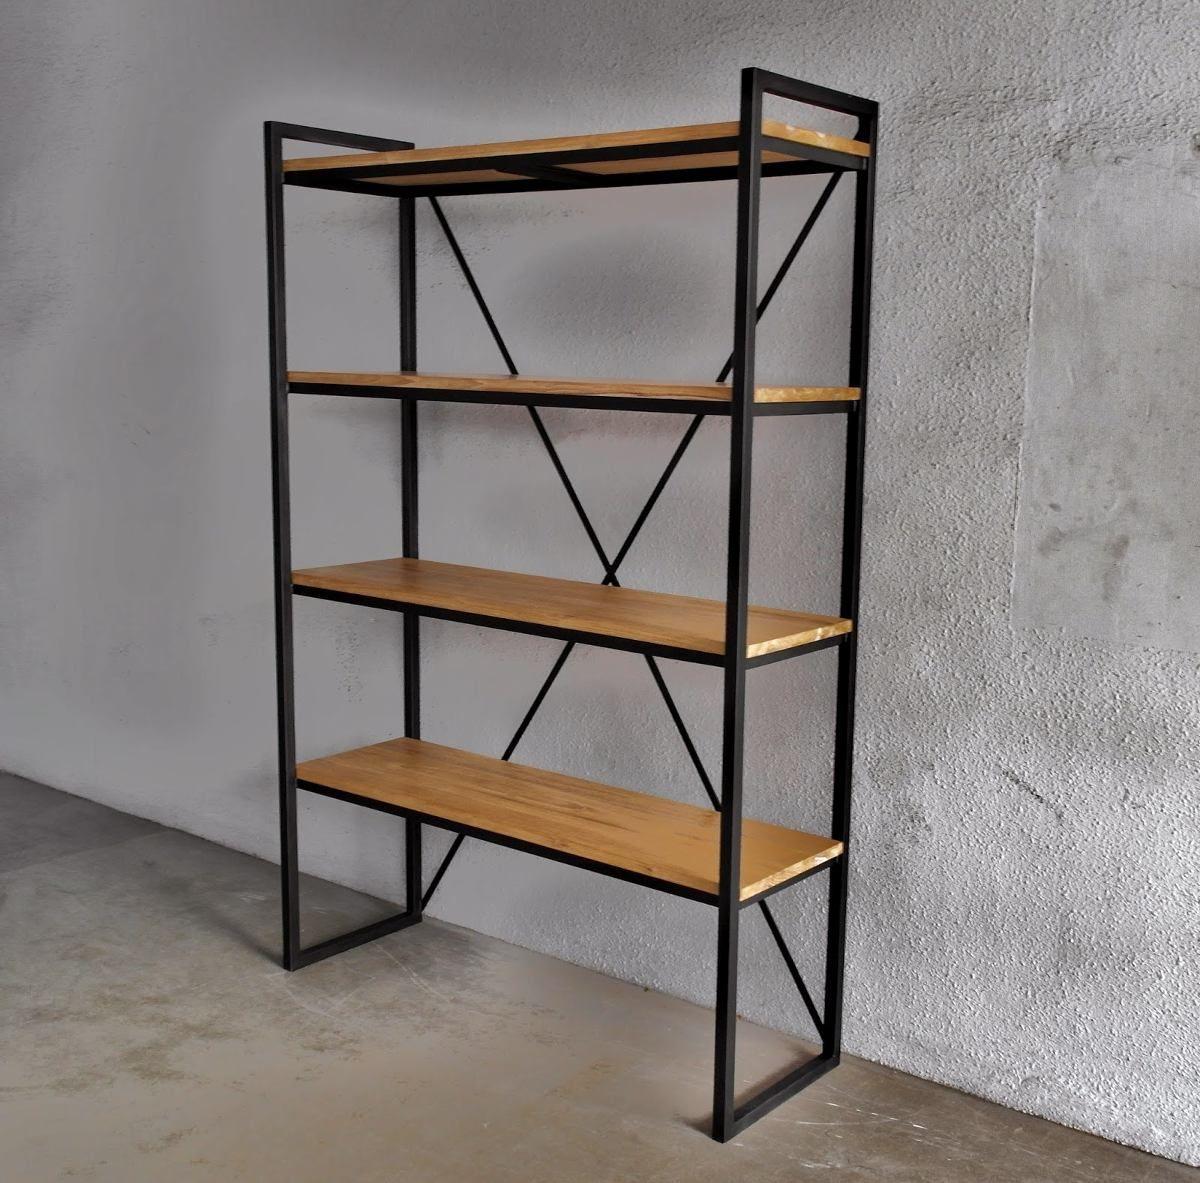 Estanteria madera hierro mesa consola ratona biblioteca - Estanterias de hierro ...